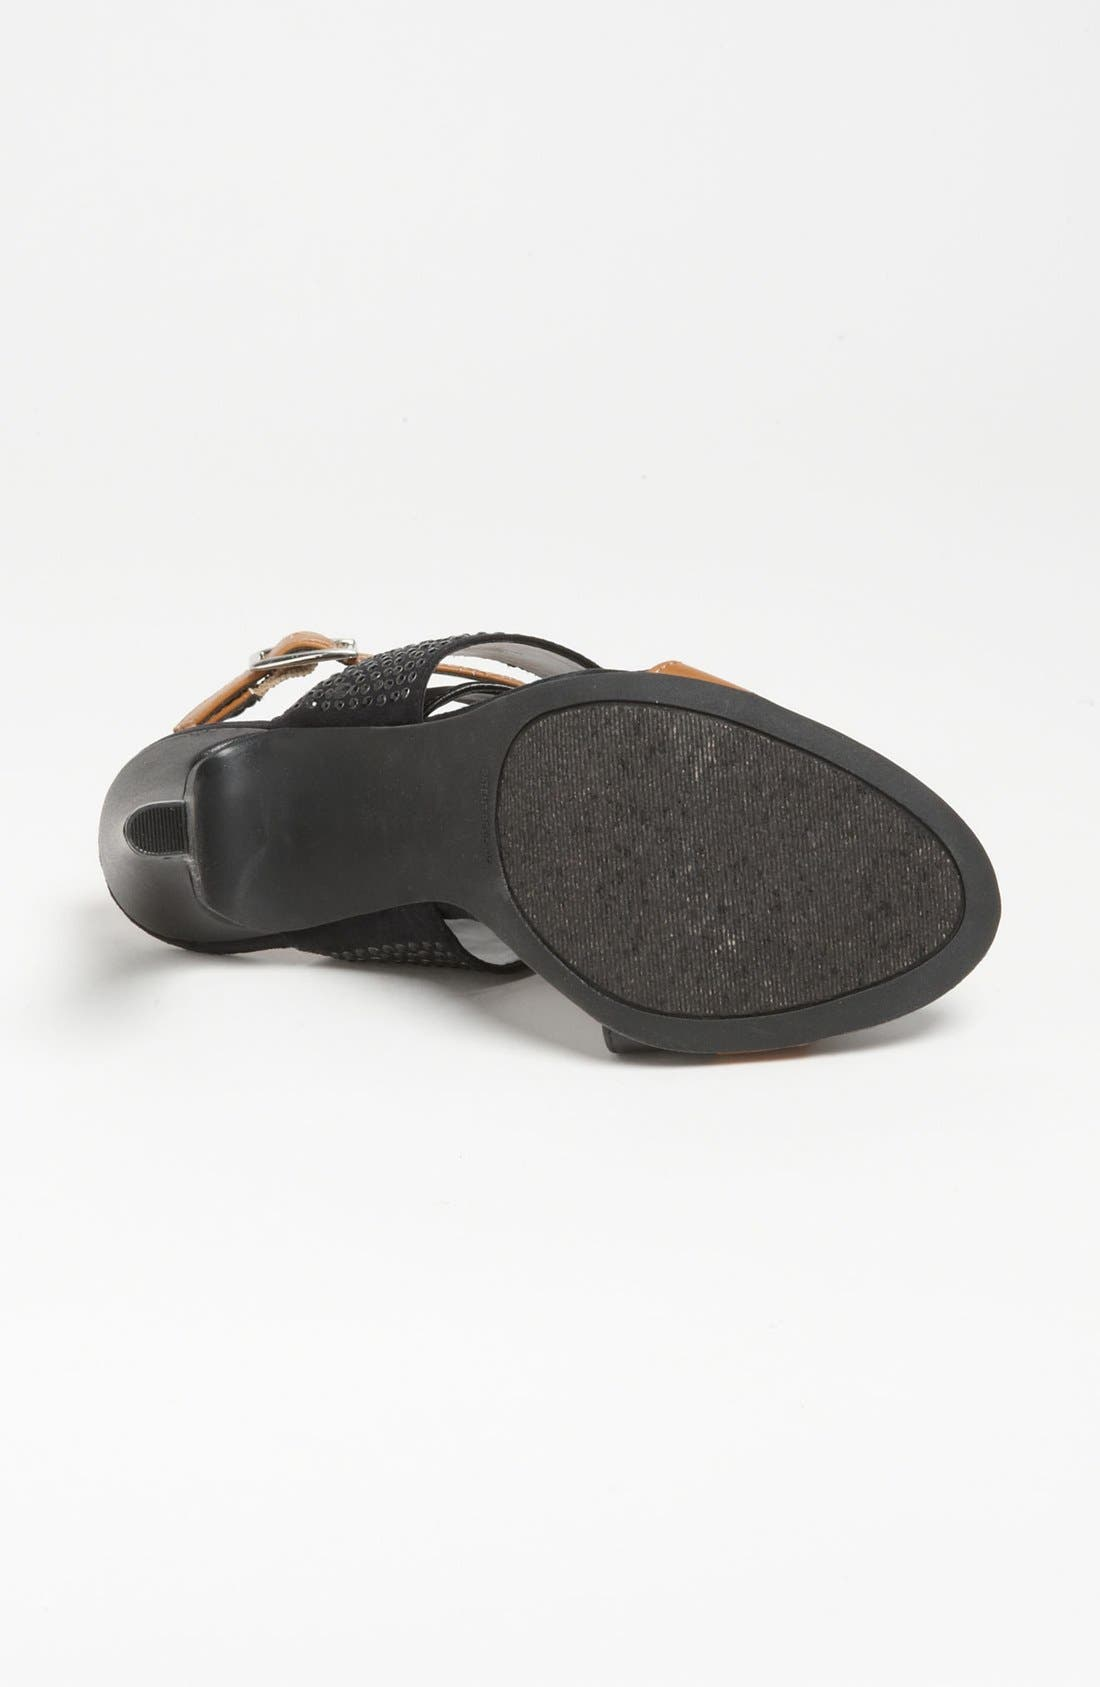 SOLE SOCIETY, 'Savannah' Sandal, Alternate thumbnail 3, color, 210